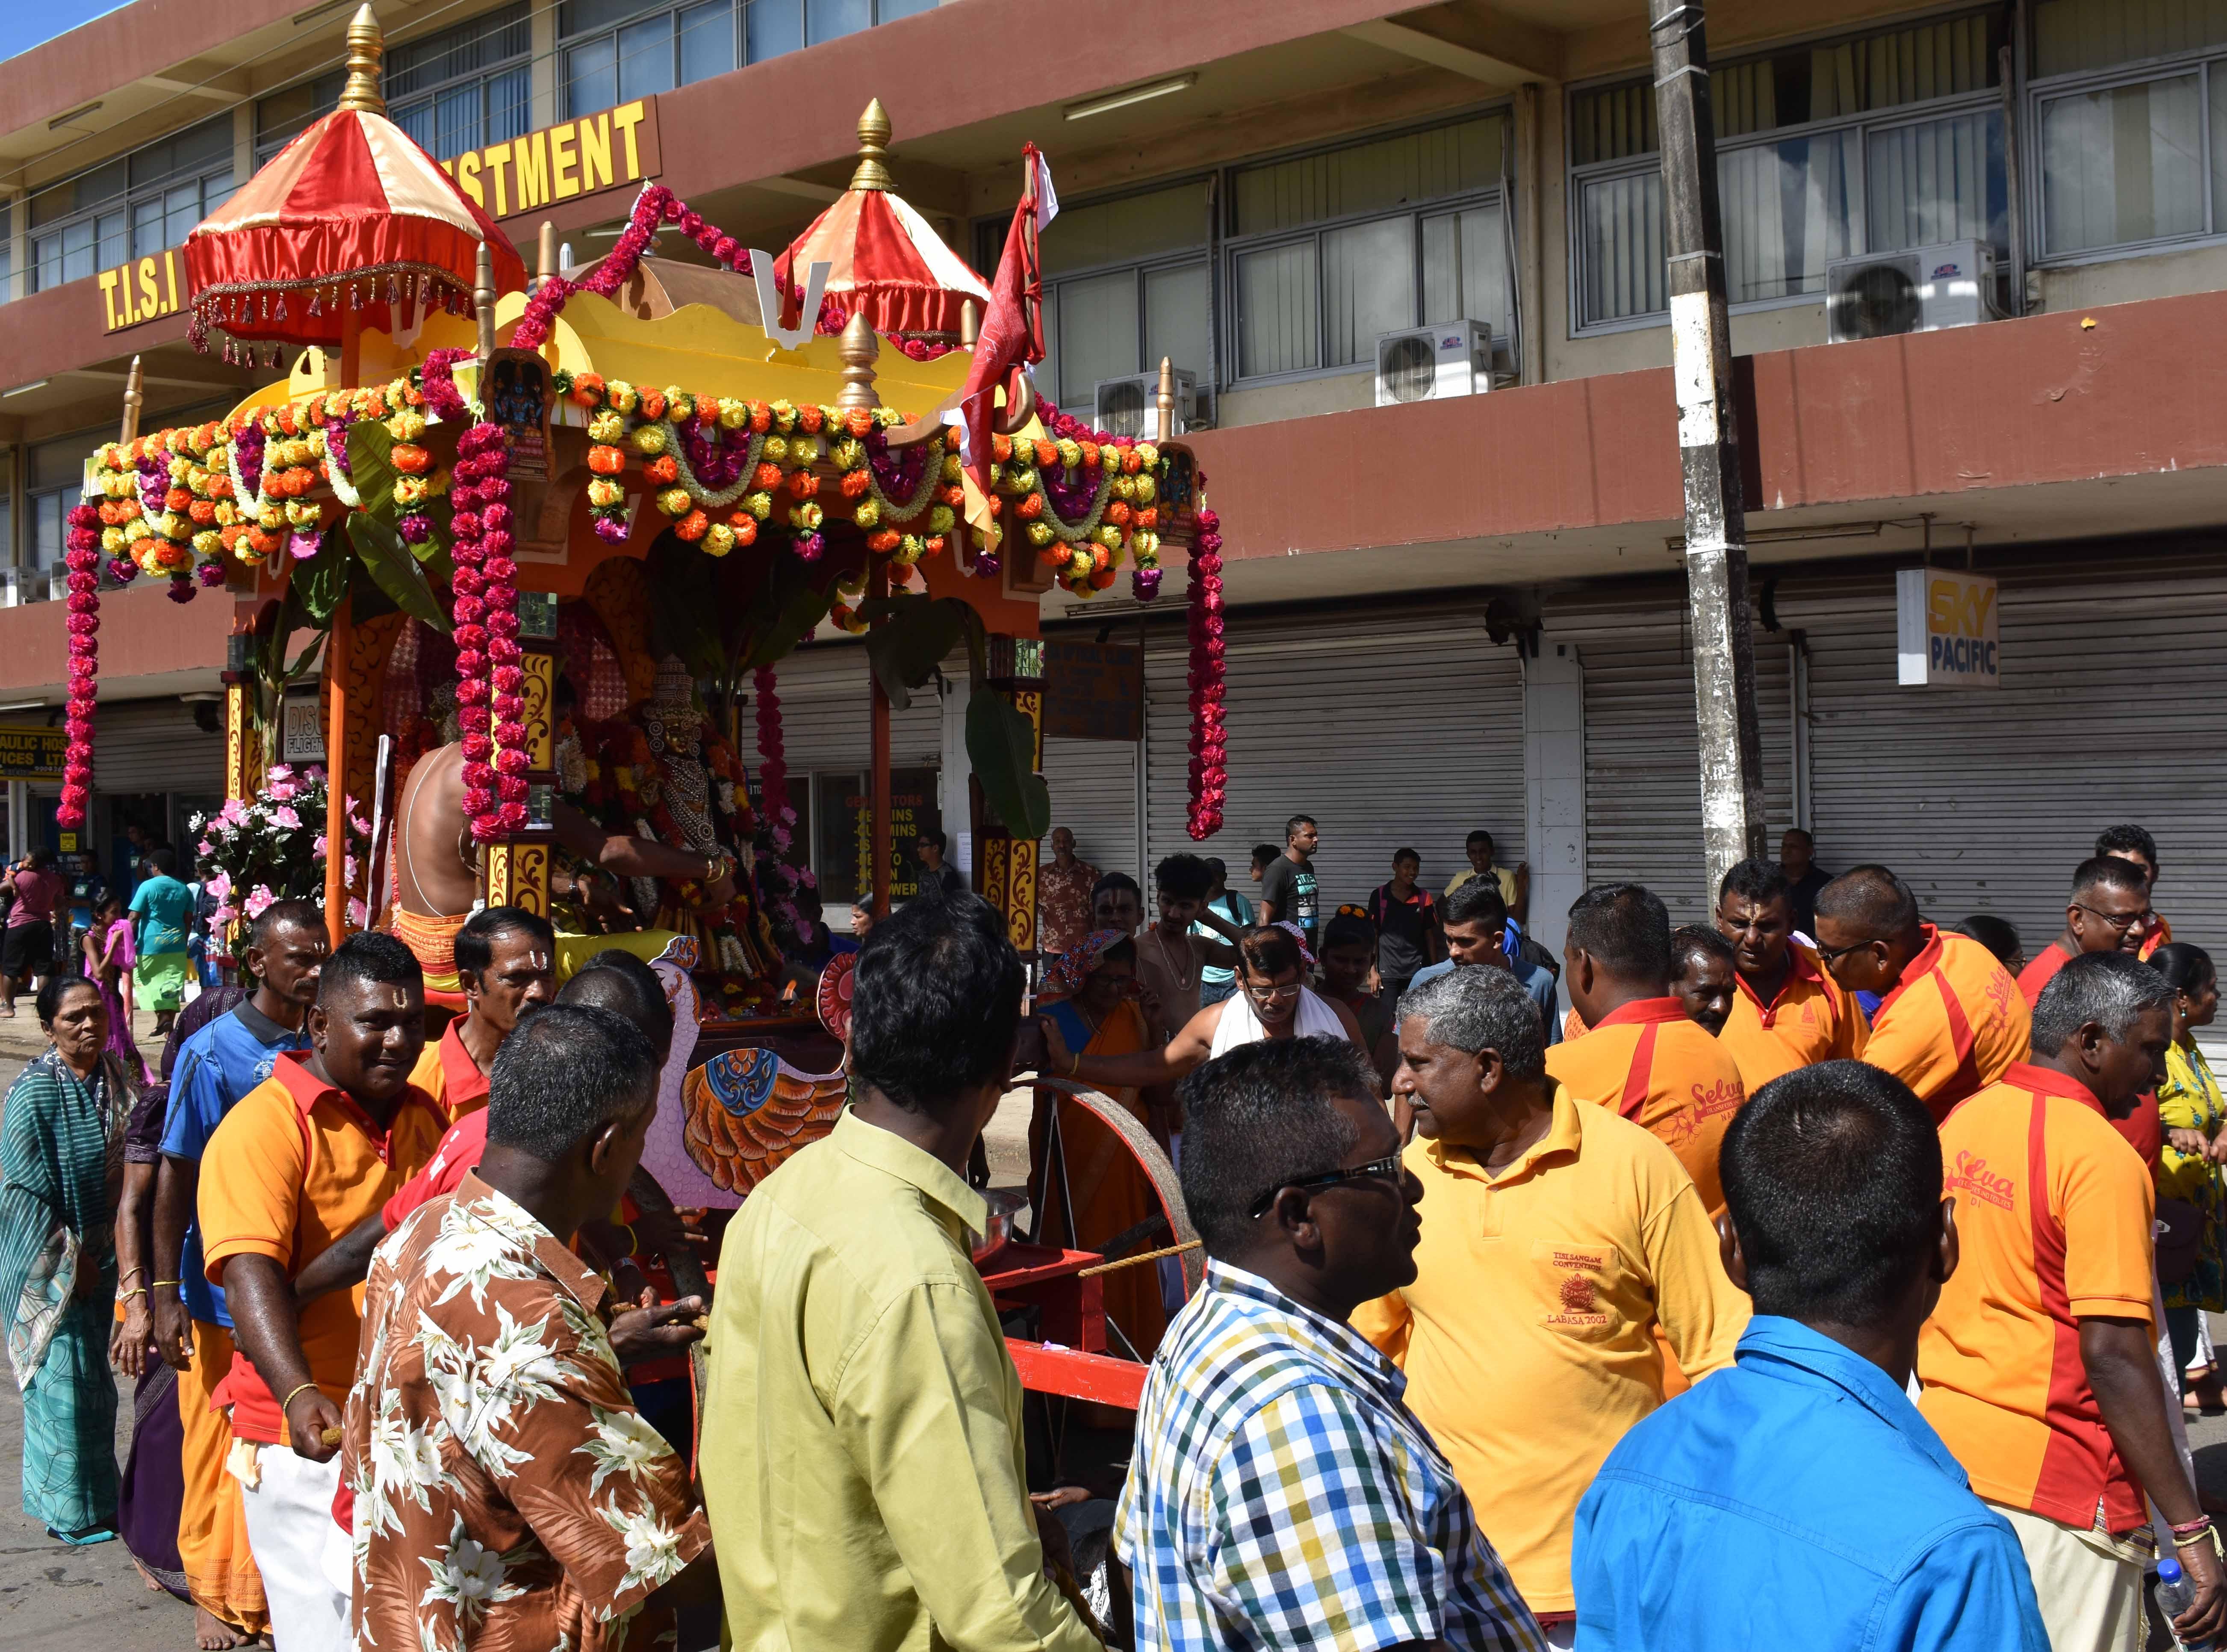 Hindu devotees gathered on Labasa street during the raath yatra on June 3, 2017. Photo:SHRATIKA NAIDU